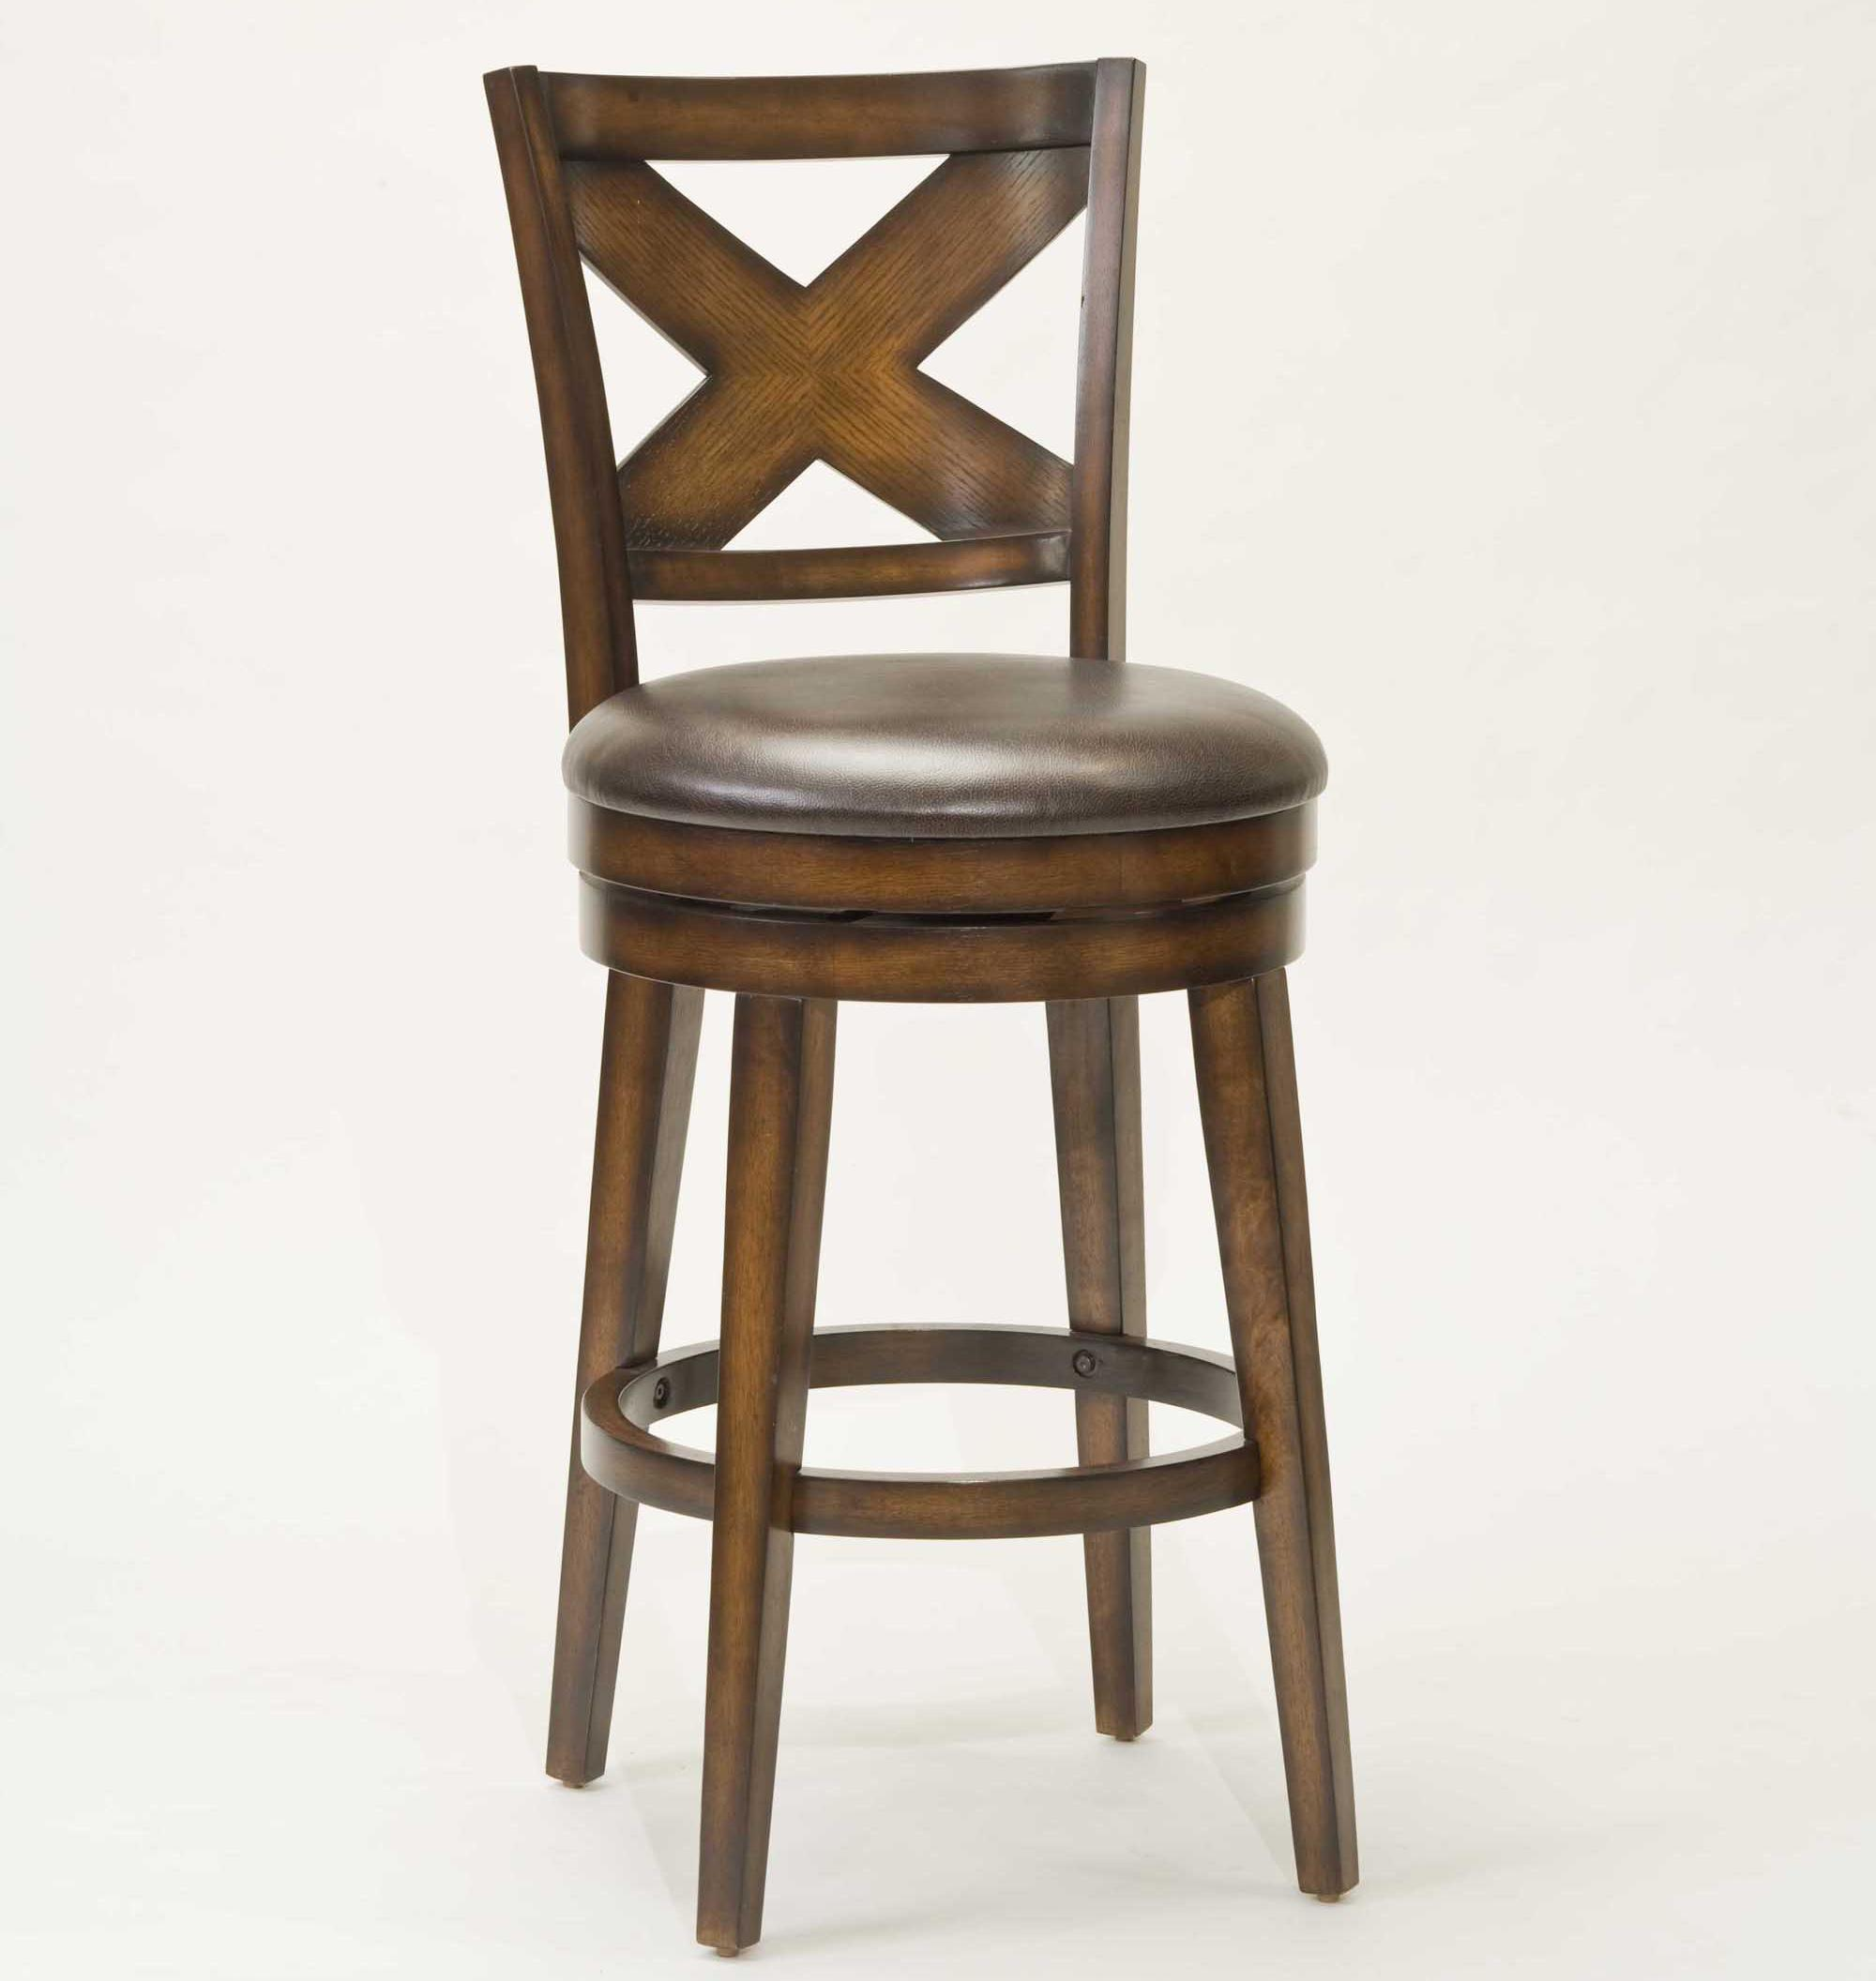 Hillsdale Wood Stools 30 Bar Height Sunhill Swivel Stool Wayside Furniture Bar Stools